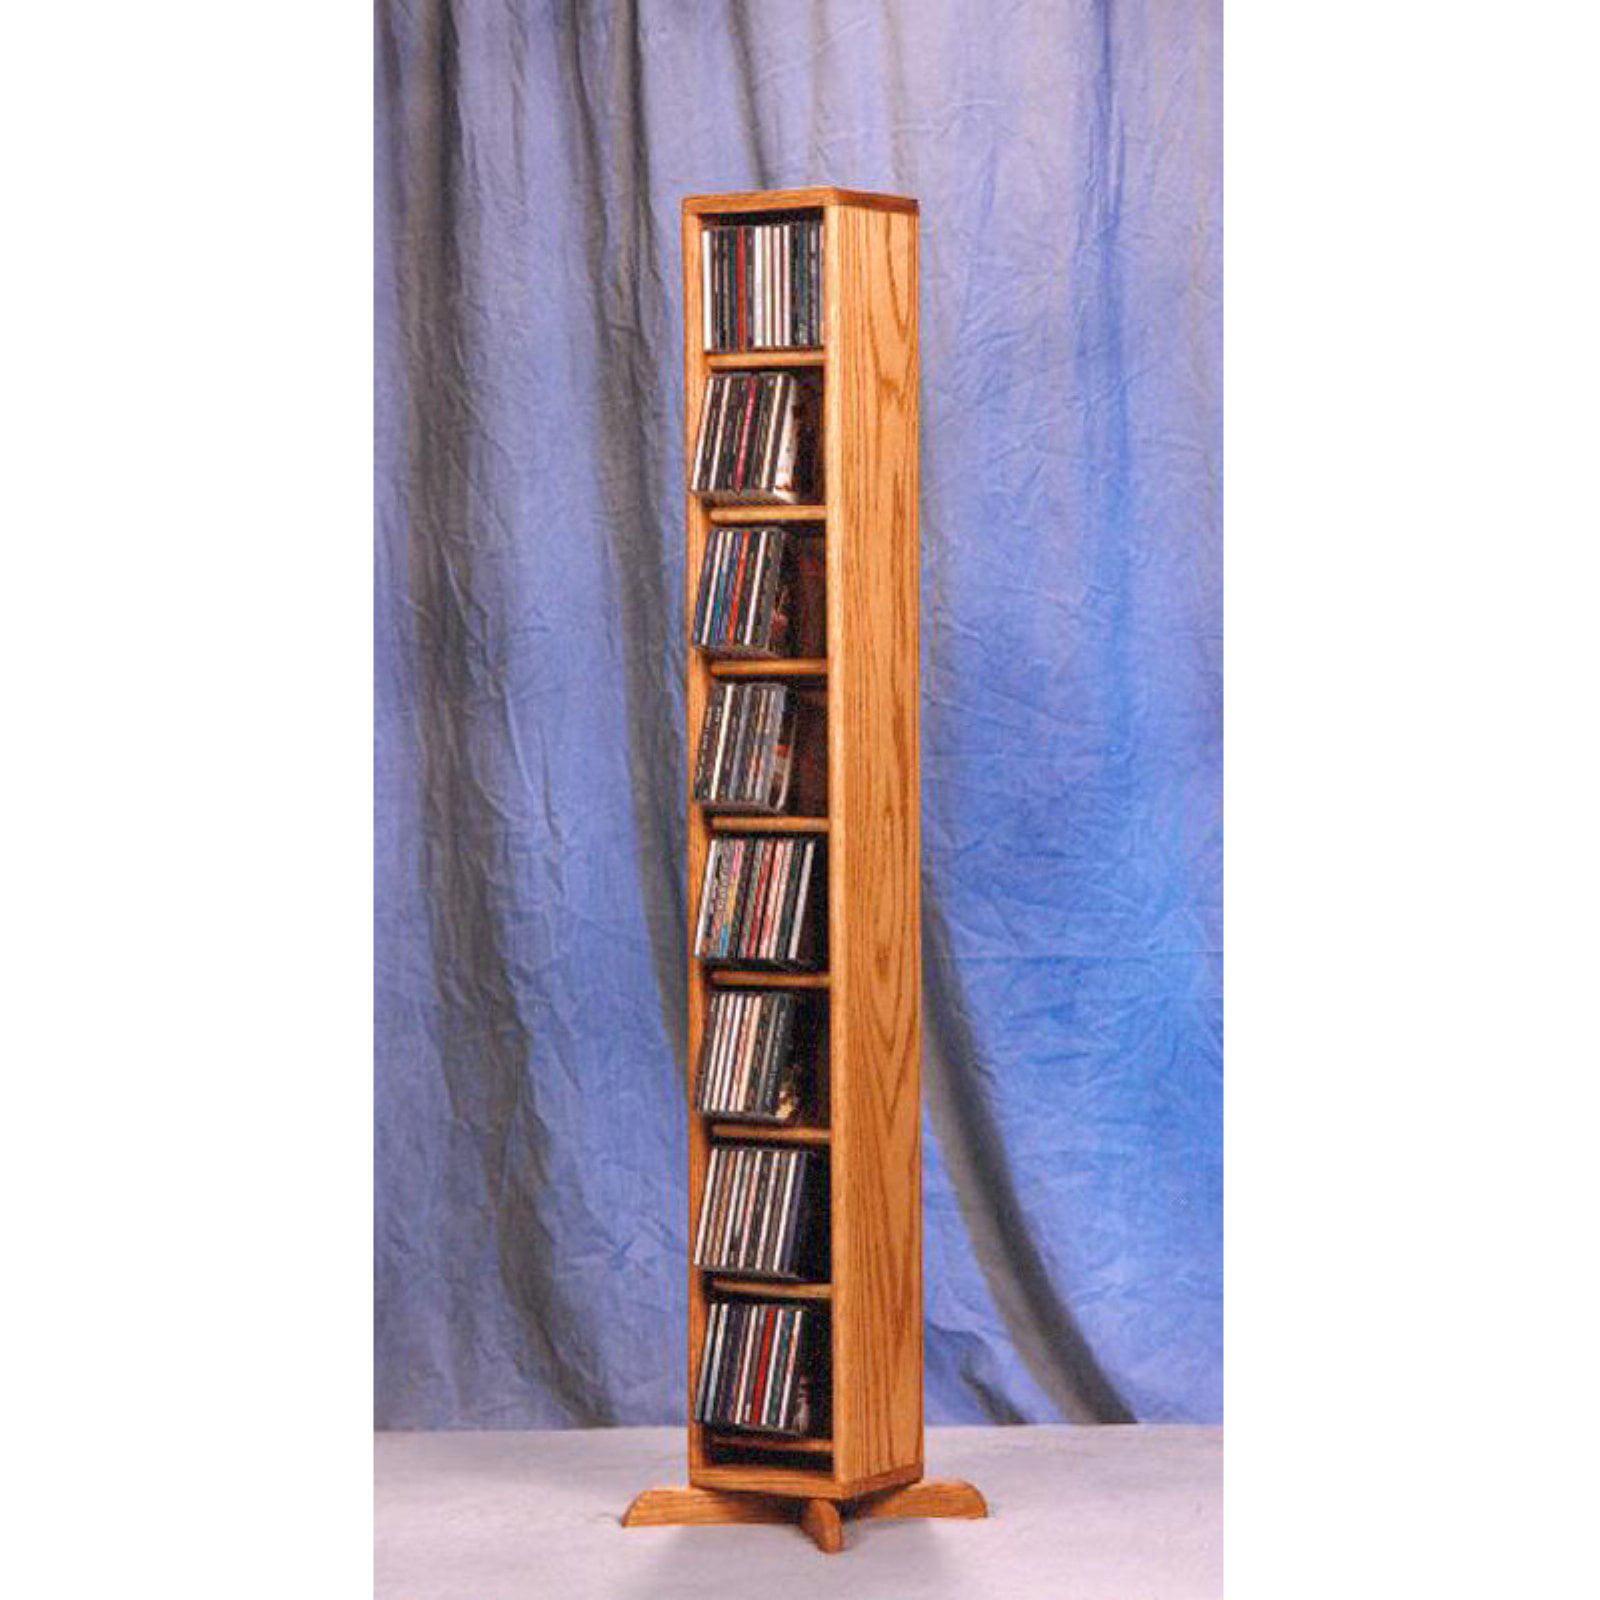 The Wood Shed Solid Oak Dowel 8 Tier 112 CD Media Cabinet